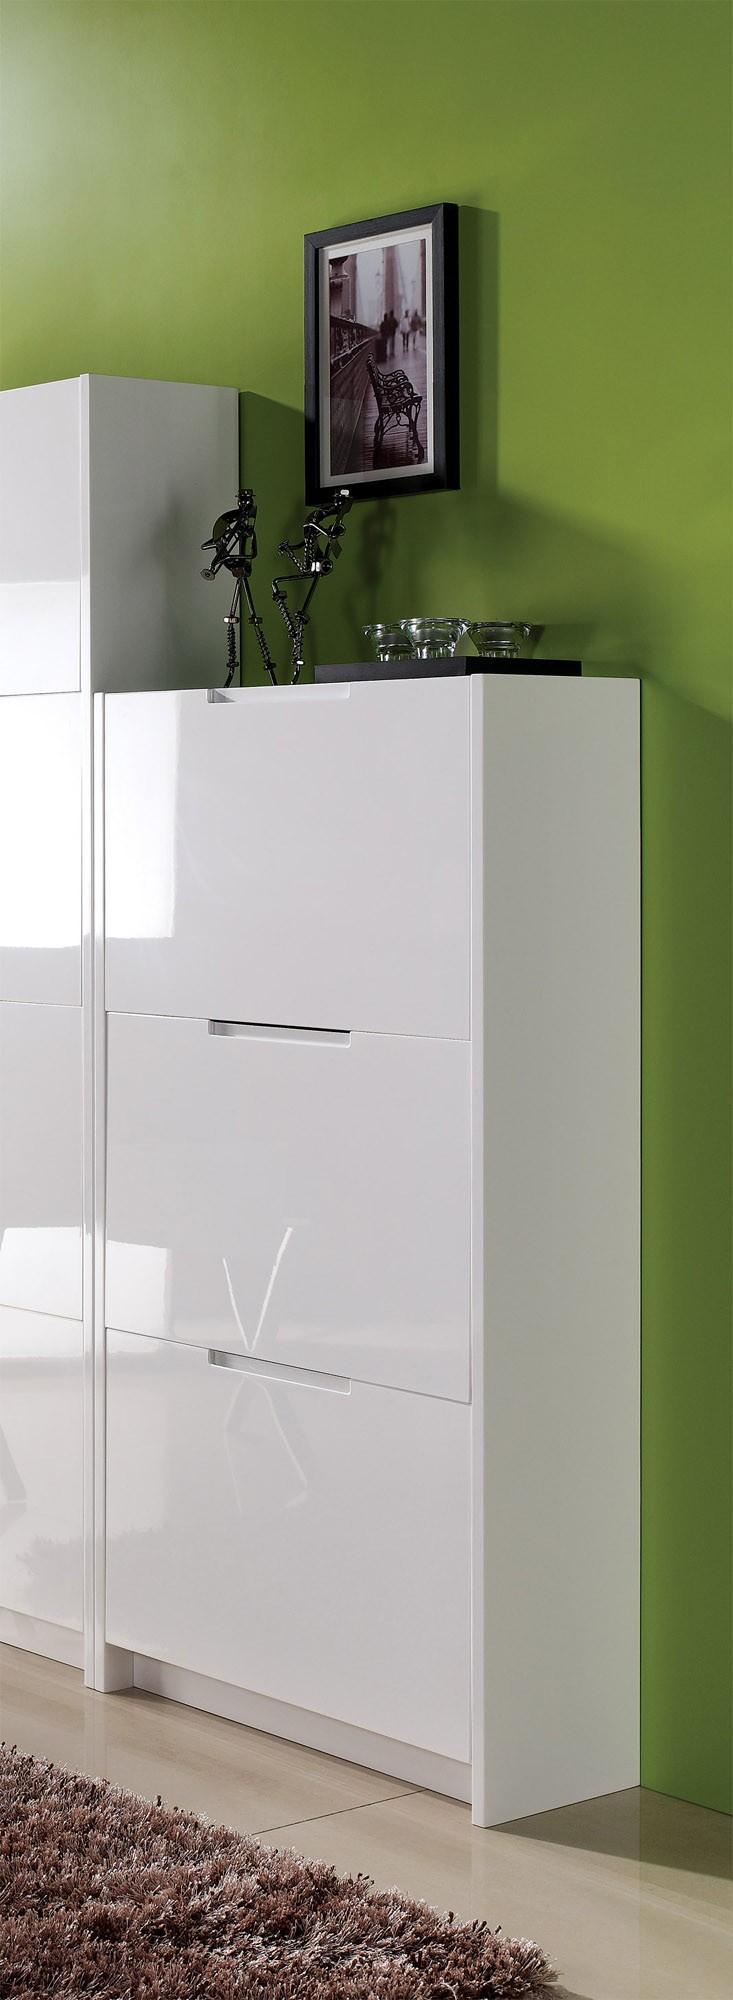 schuhschrank mod s565 3 weiss hochglanz h c m bel. Black Bedroom Furniture Sets. Home Design Ideas